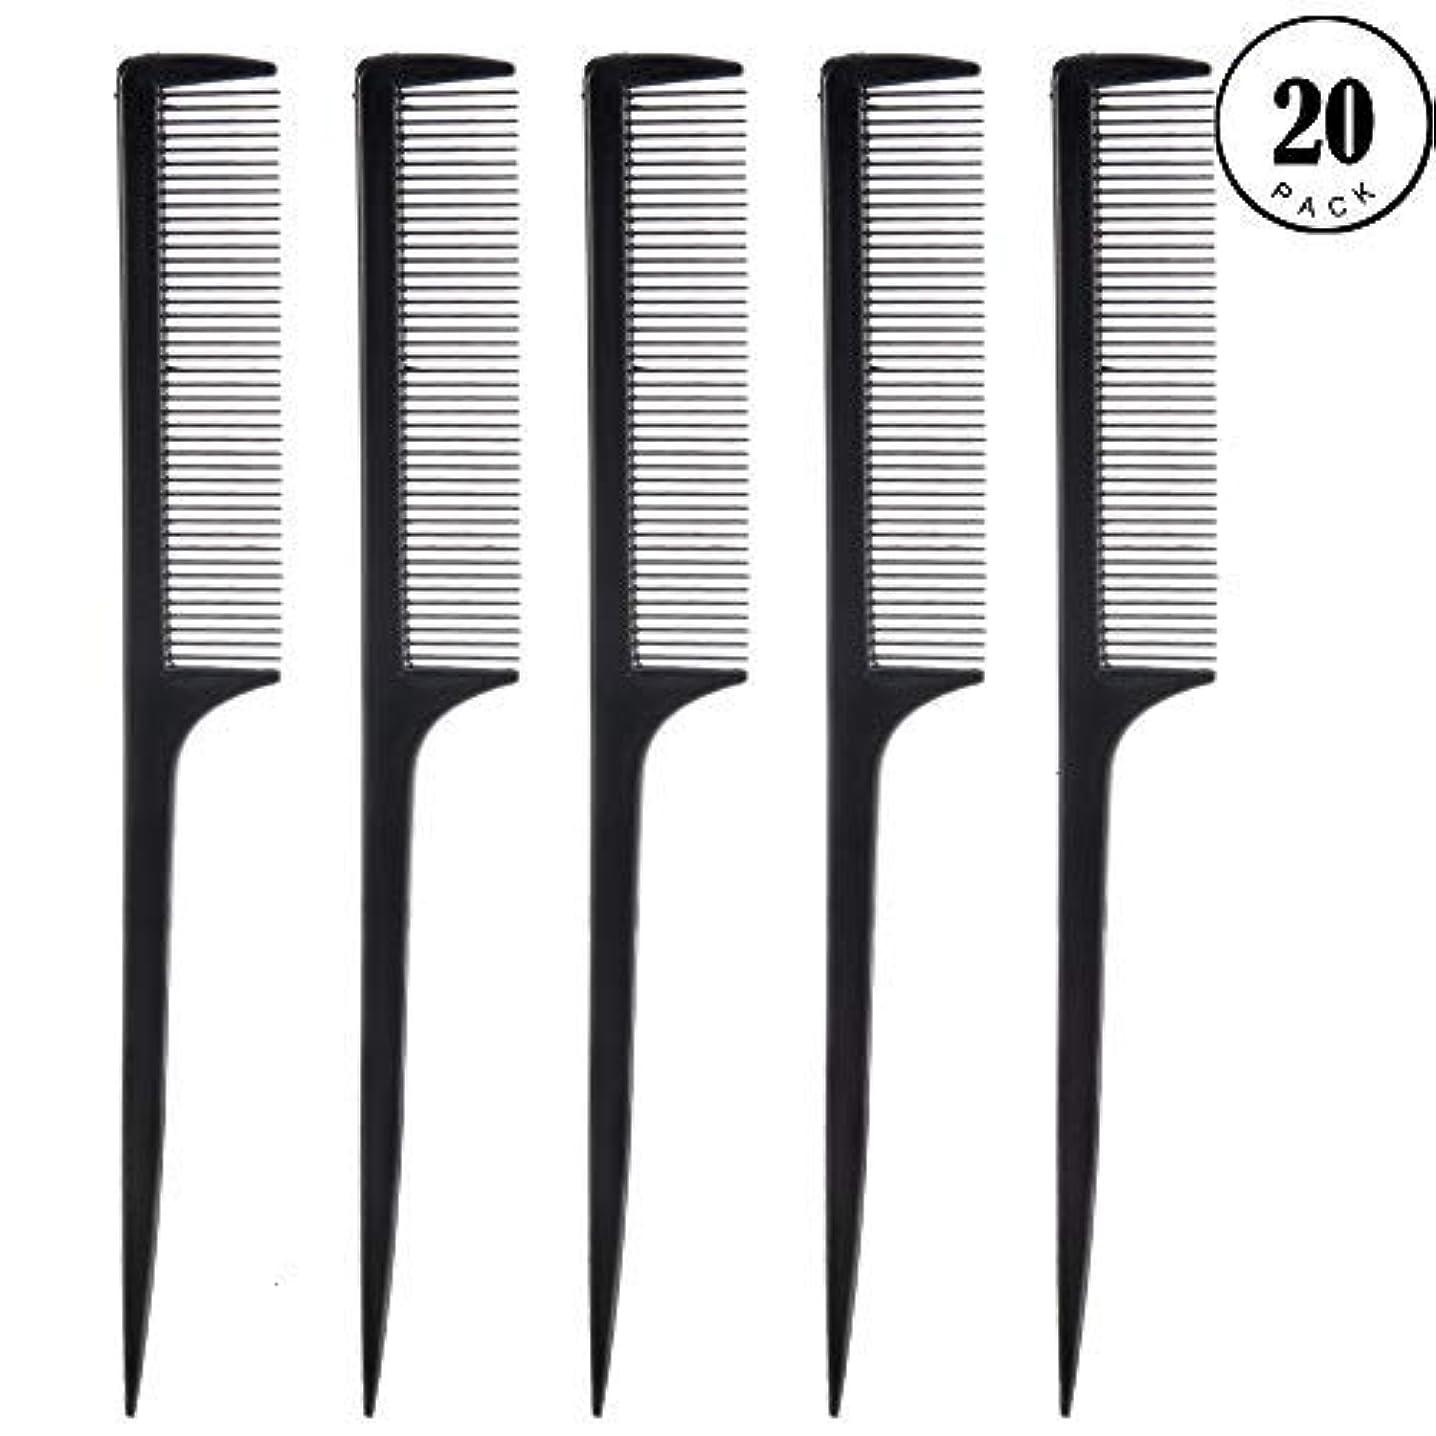 糞無駄に外交問題Feeko Comb, 20 Pieces 21CM Plastic Lightweight Rat Tail Comb All Hair Types Black [並行輸入品]